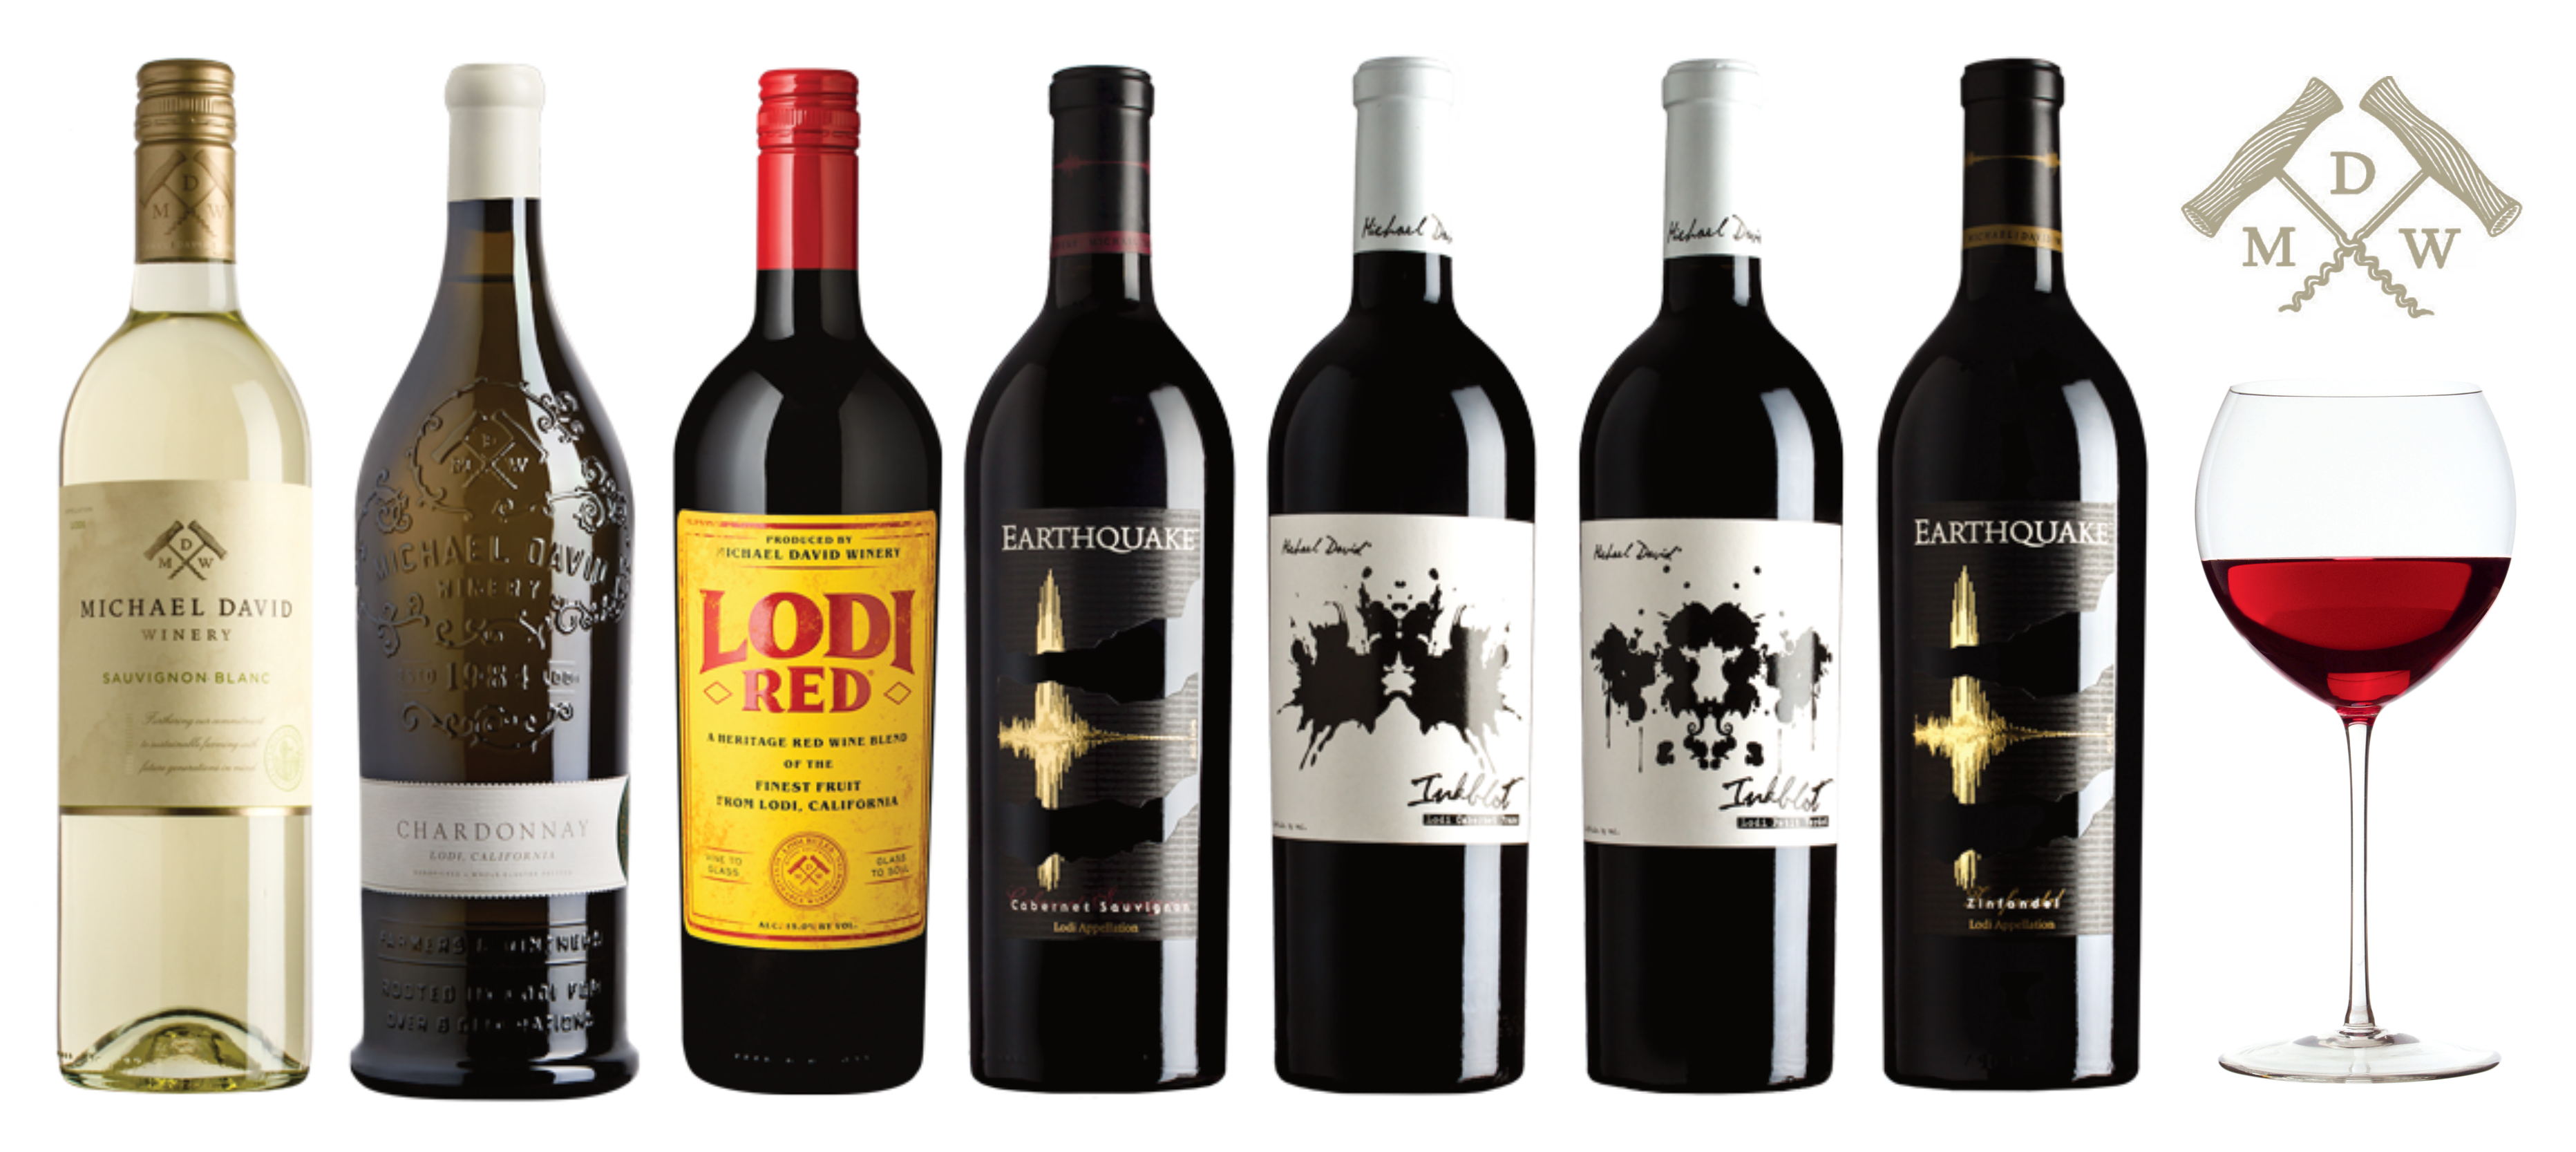 Michael David Winery Wines